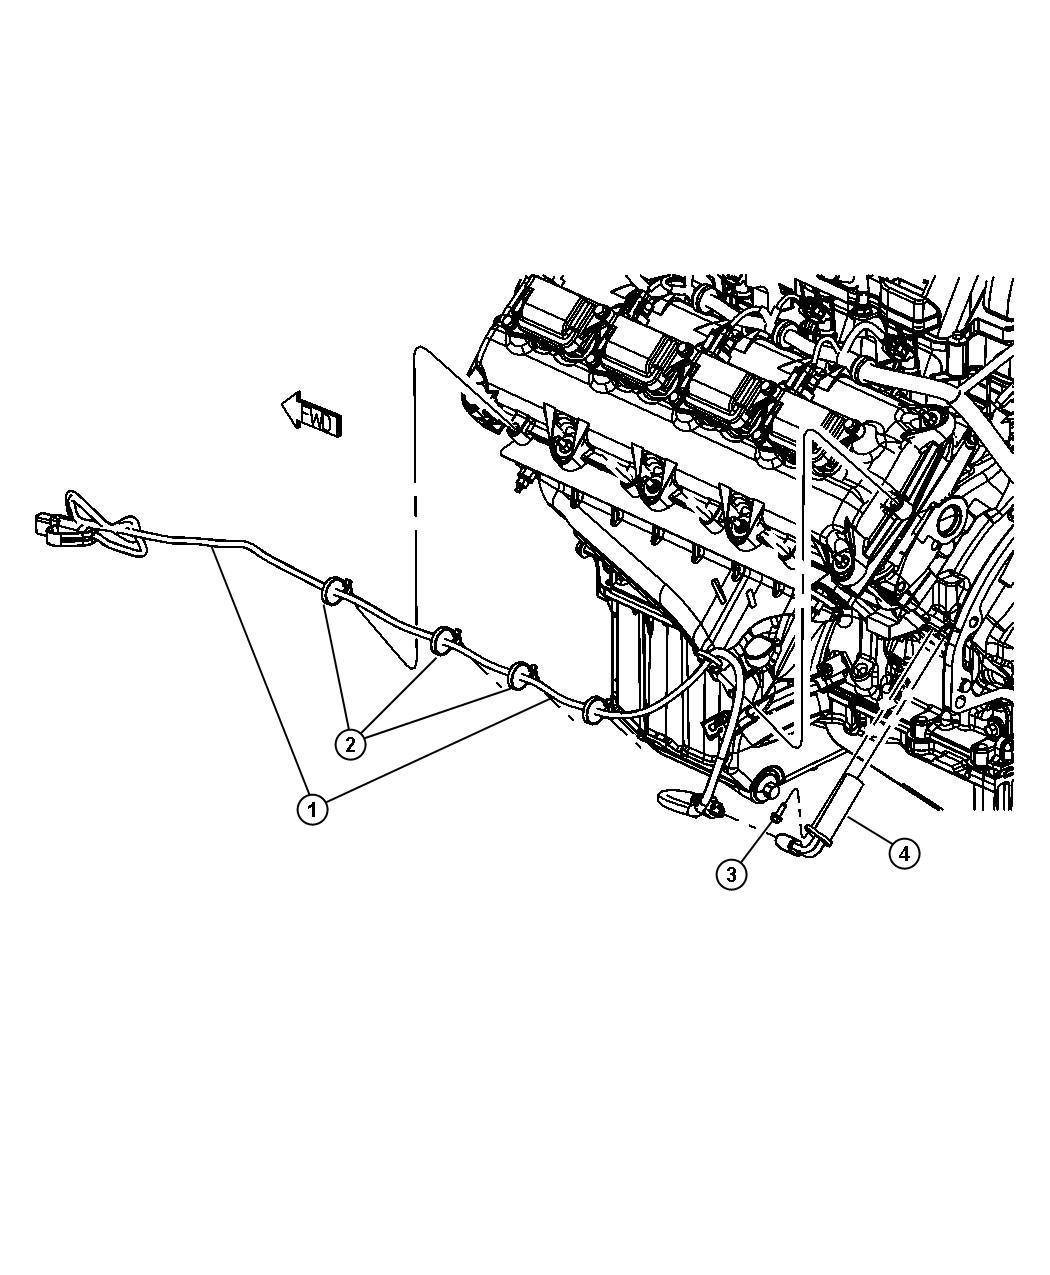 jeep wrangler heater wiring diagram view diagram jeep wrangler on